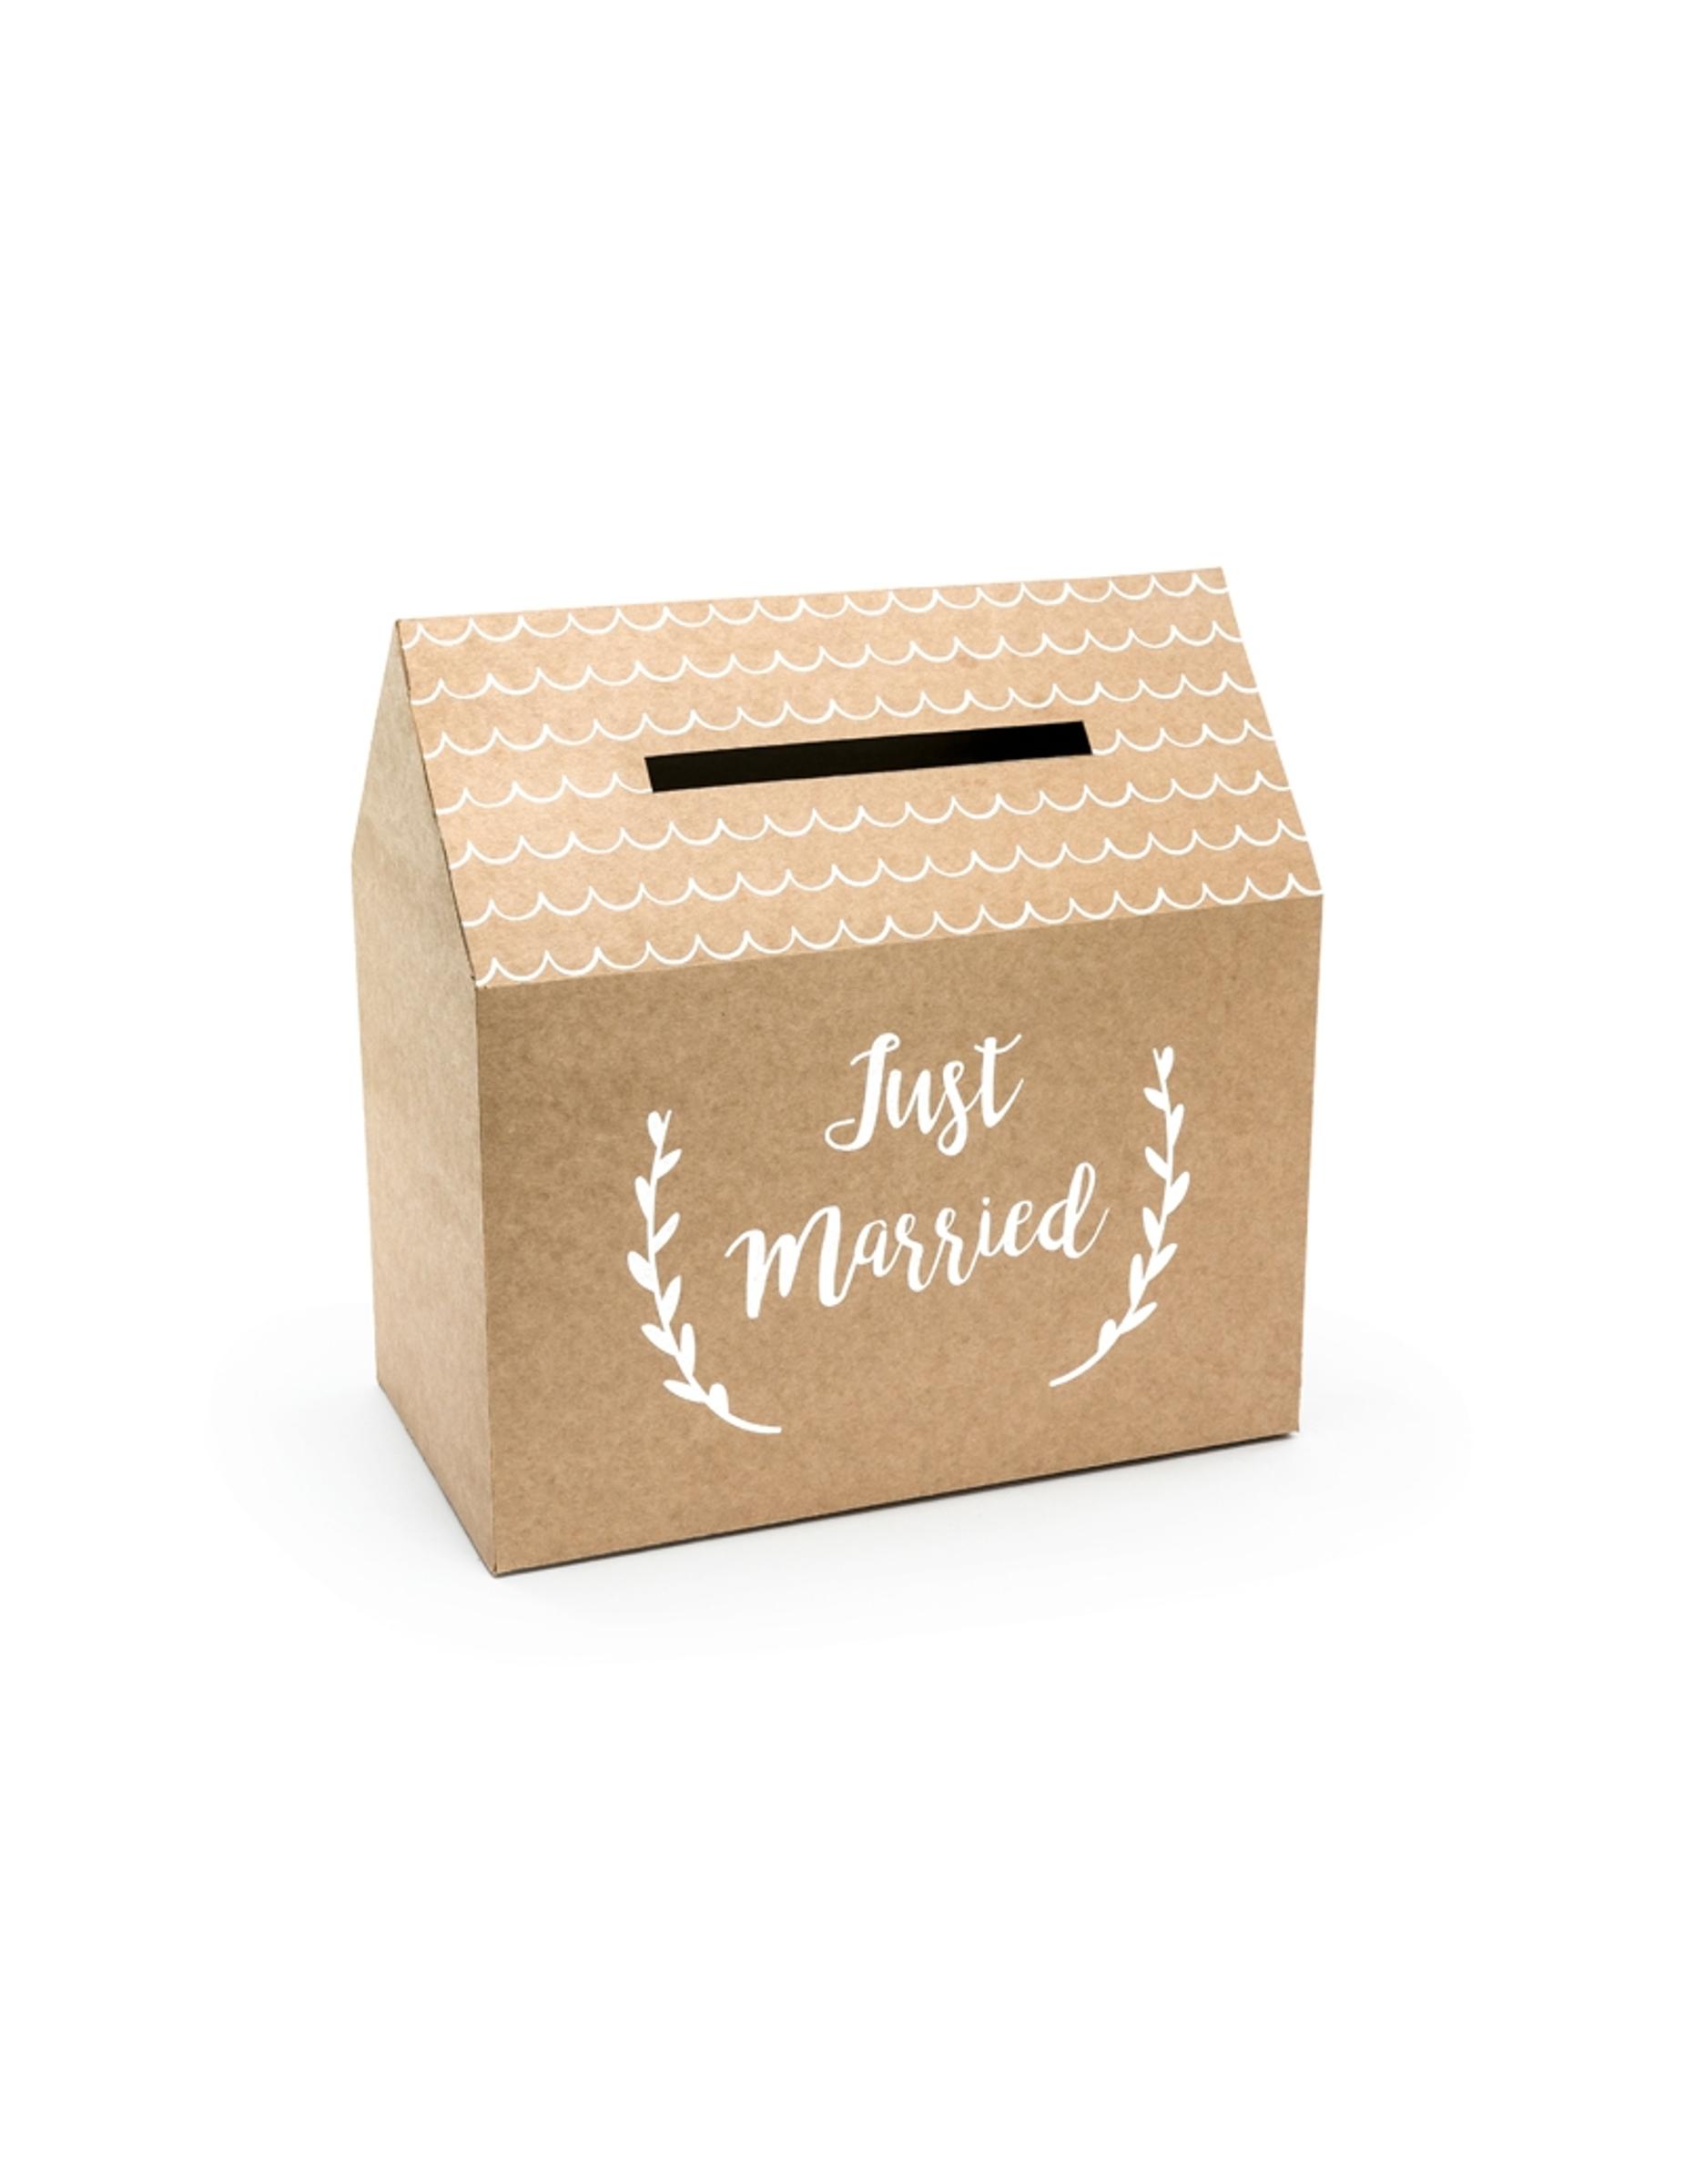 urne en carton kraft just married 30 x 30 5 x 16 5 cm d coration anniversaire et f tes th me. Black Bedroom Furniture Sets. Home Design Ideas